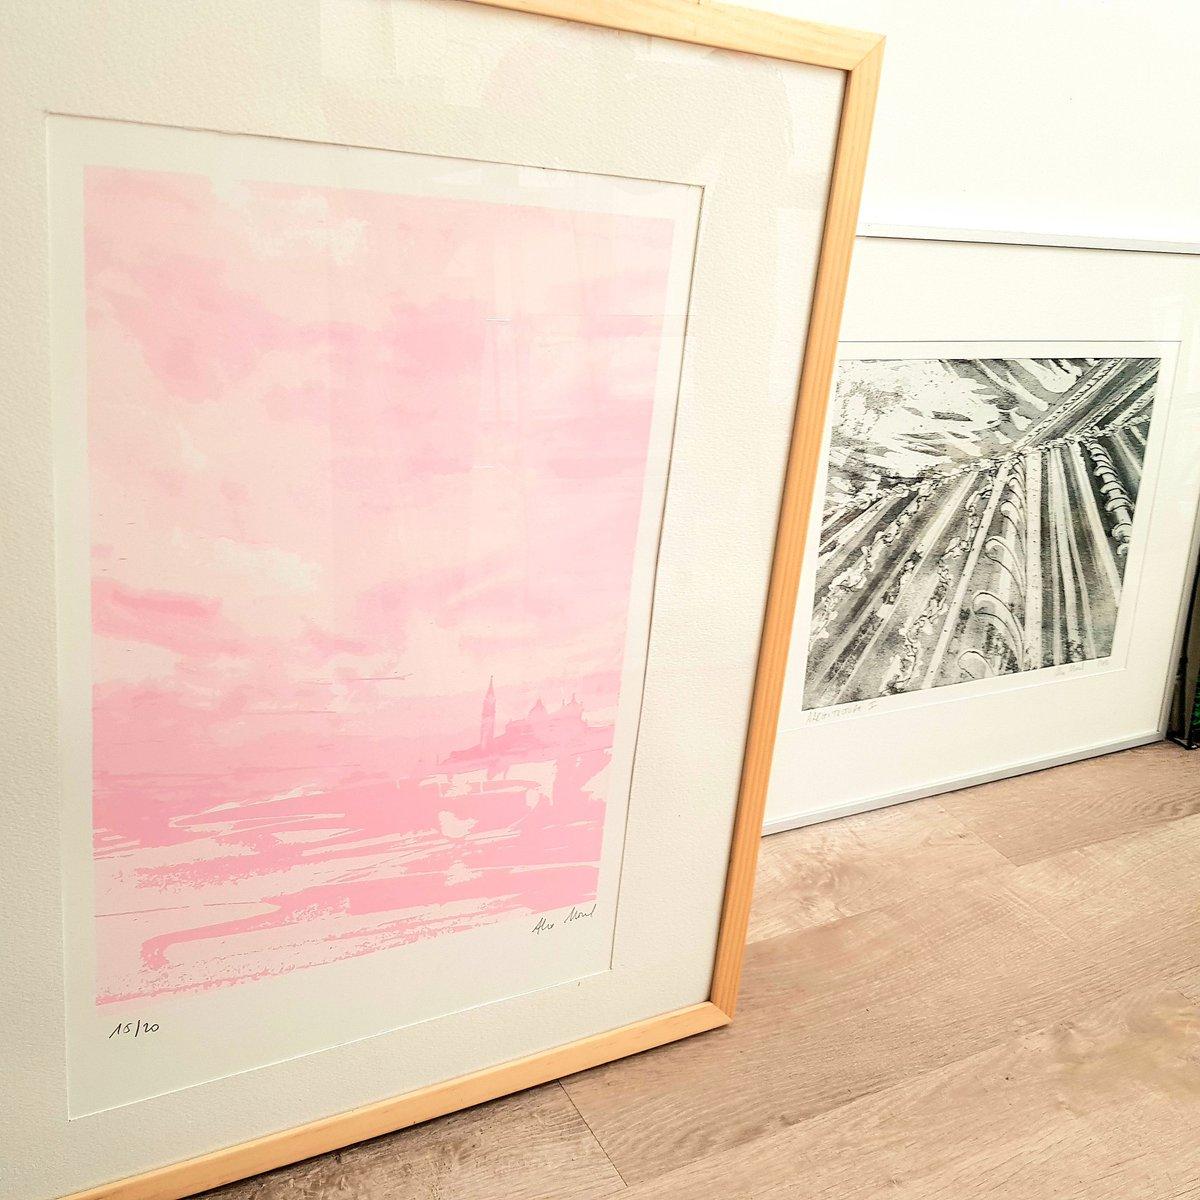 En plein accrochage pour ma prochaine exposition!🖼🔧🏷  #estampe #exhibition #eauforte #exposition #printmaking #litografia #monotype #serigraphie #venice #serigrafia https://t.co/ooOenXQKvO